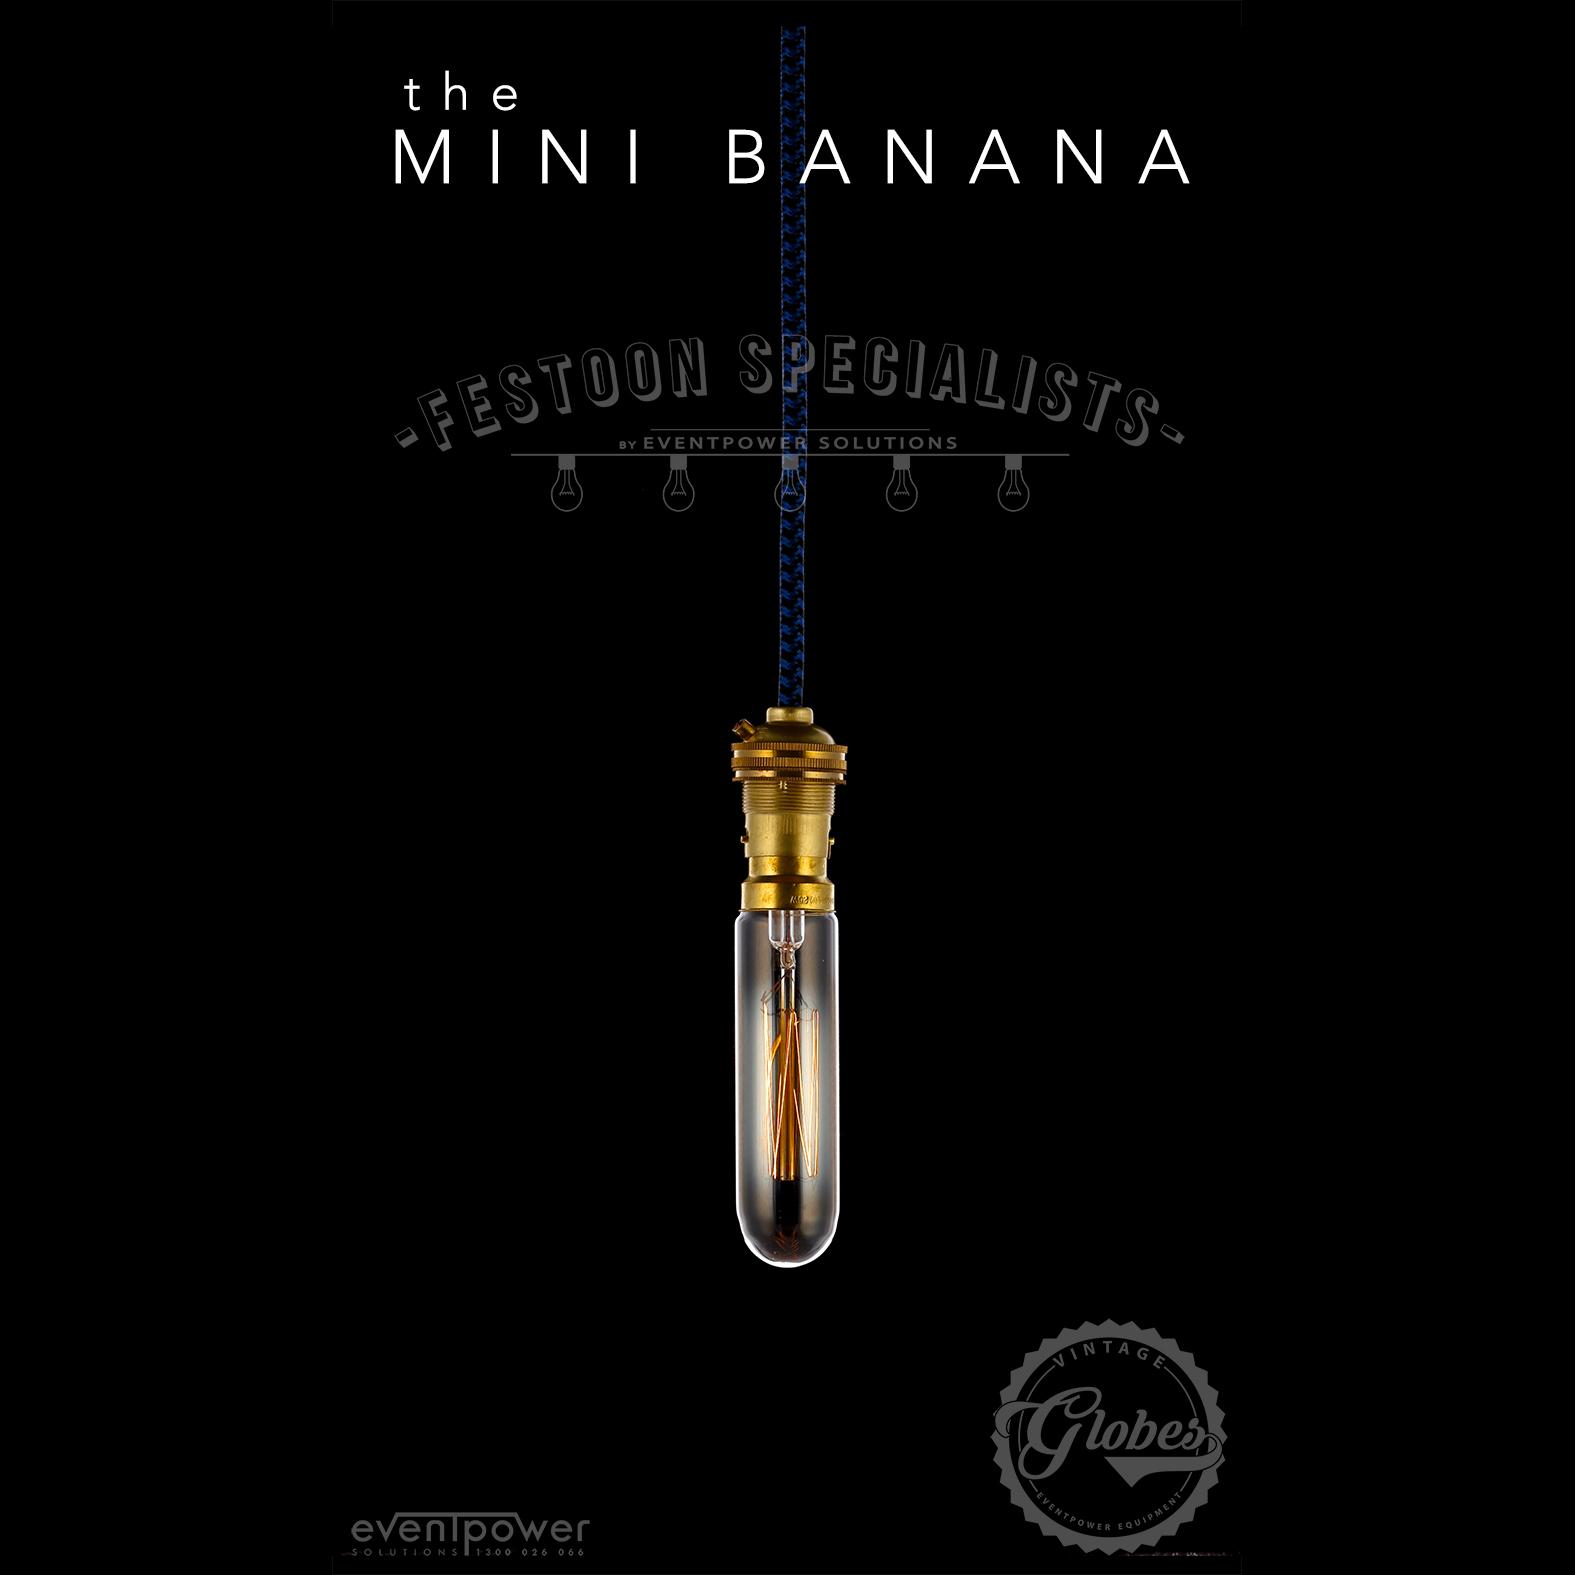 Festoon_Specialists-Mini_Banana.jpg